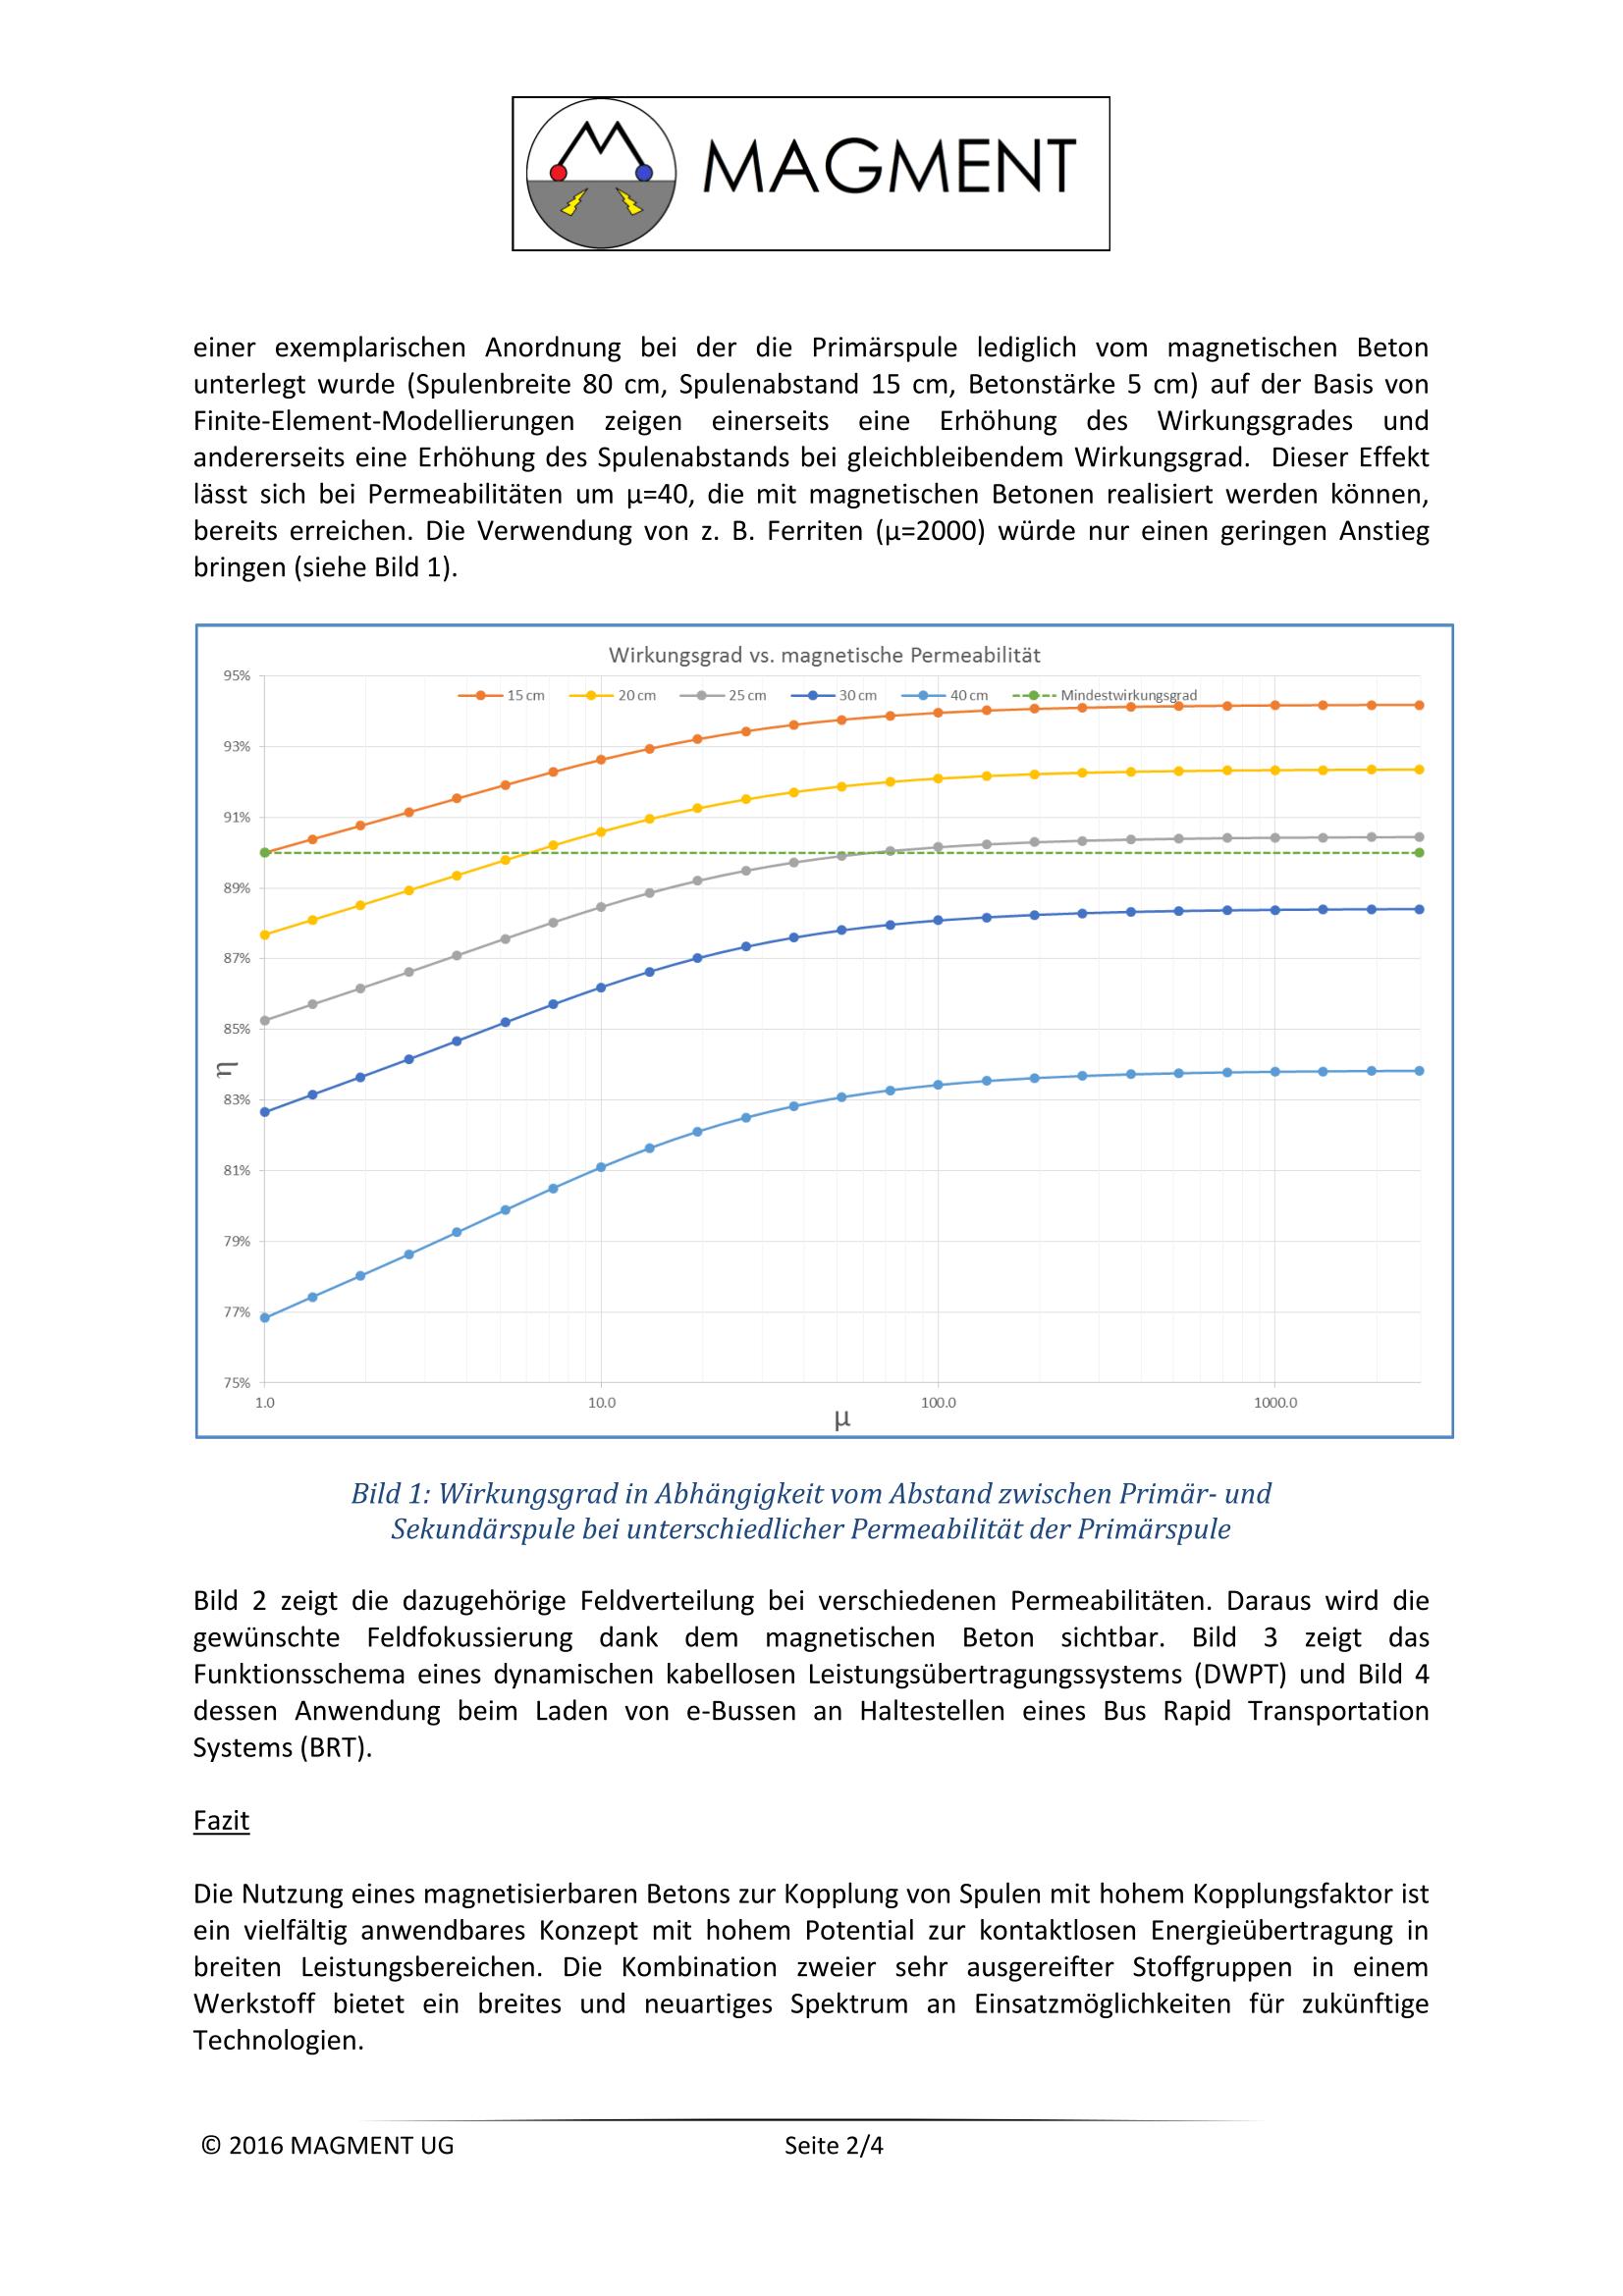 Induktive_Energieübertragung_mit_MAGMENT-2.png